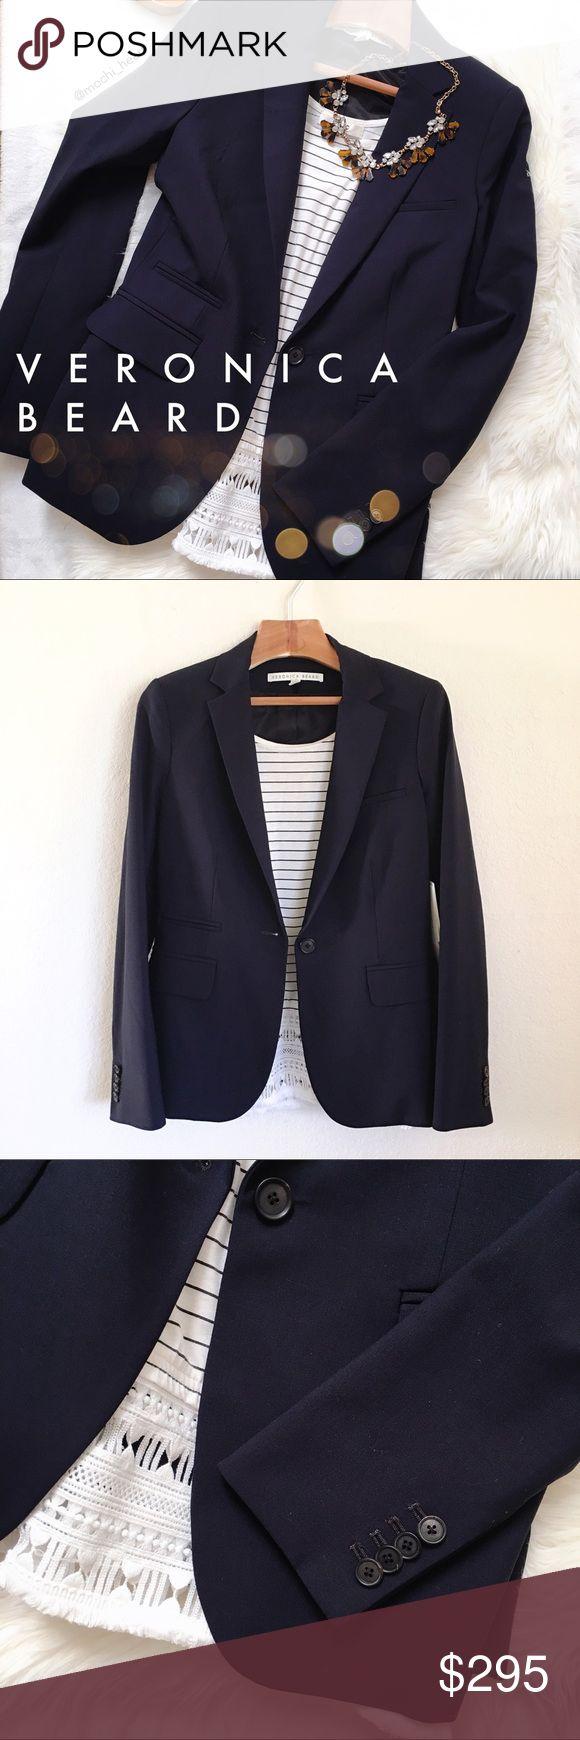 Veronica Beard classic navy blazer Dark navy blazer by Veronica Beard in a classic silhouette. Well made and very sophisticated. Veronica Beard Jackets & Coats Blazers